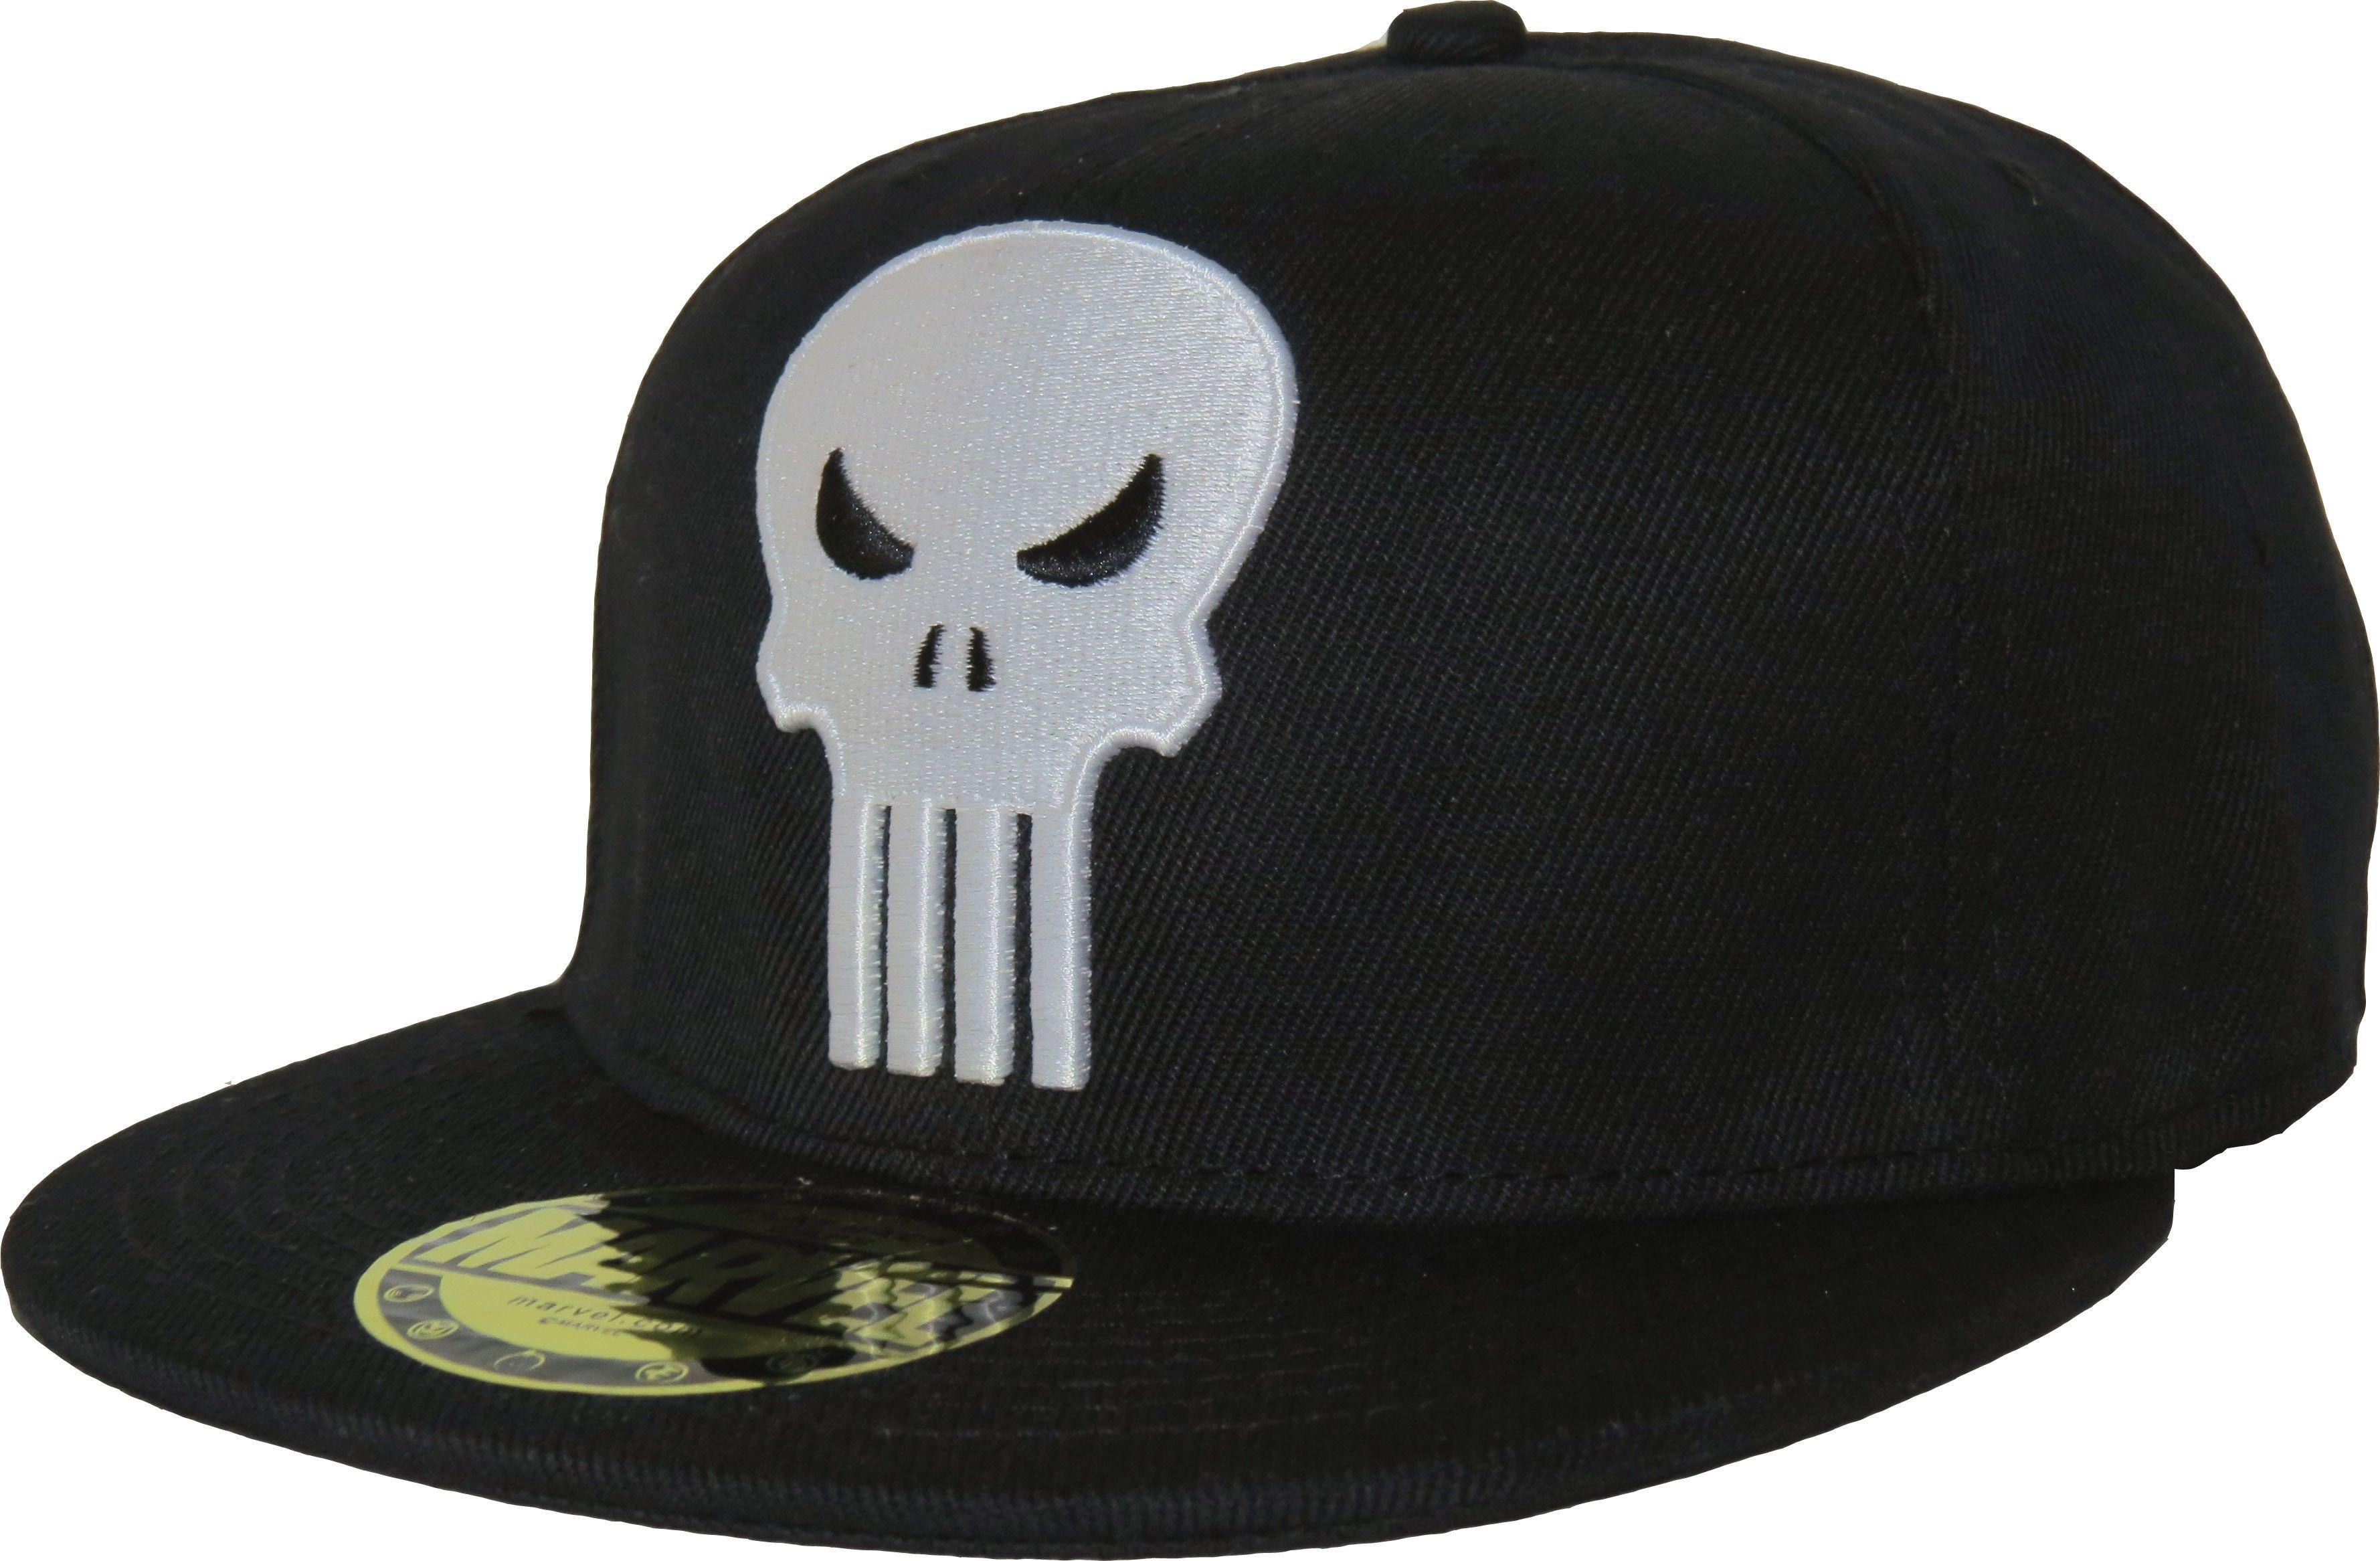 7bb0bd94e55 Marvel Comics Official Punisher Snap-back Cap. Black with The Punisher  front Skull logo